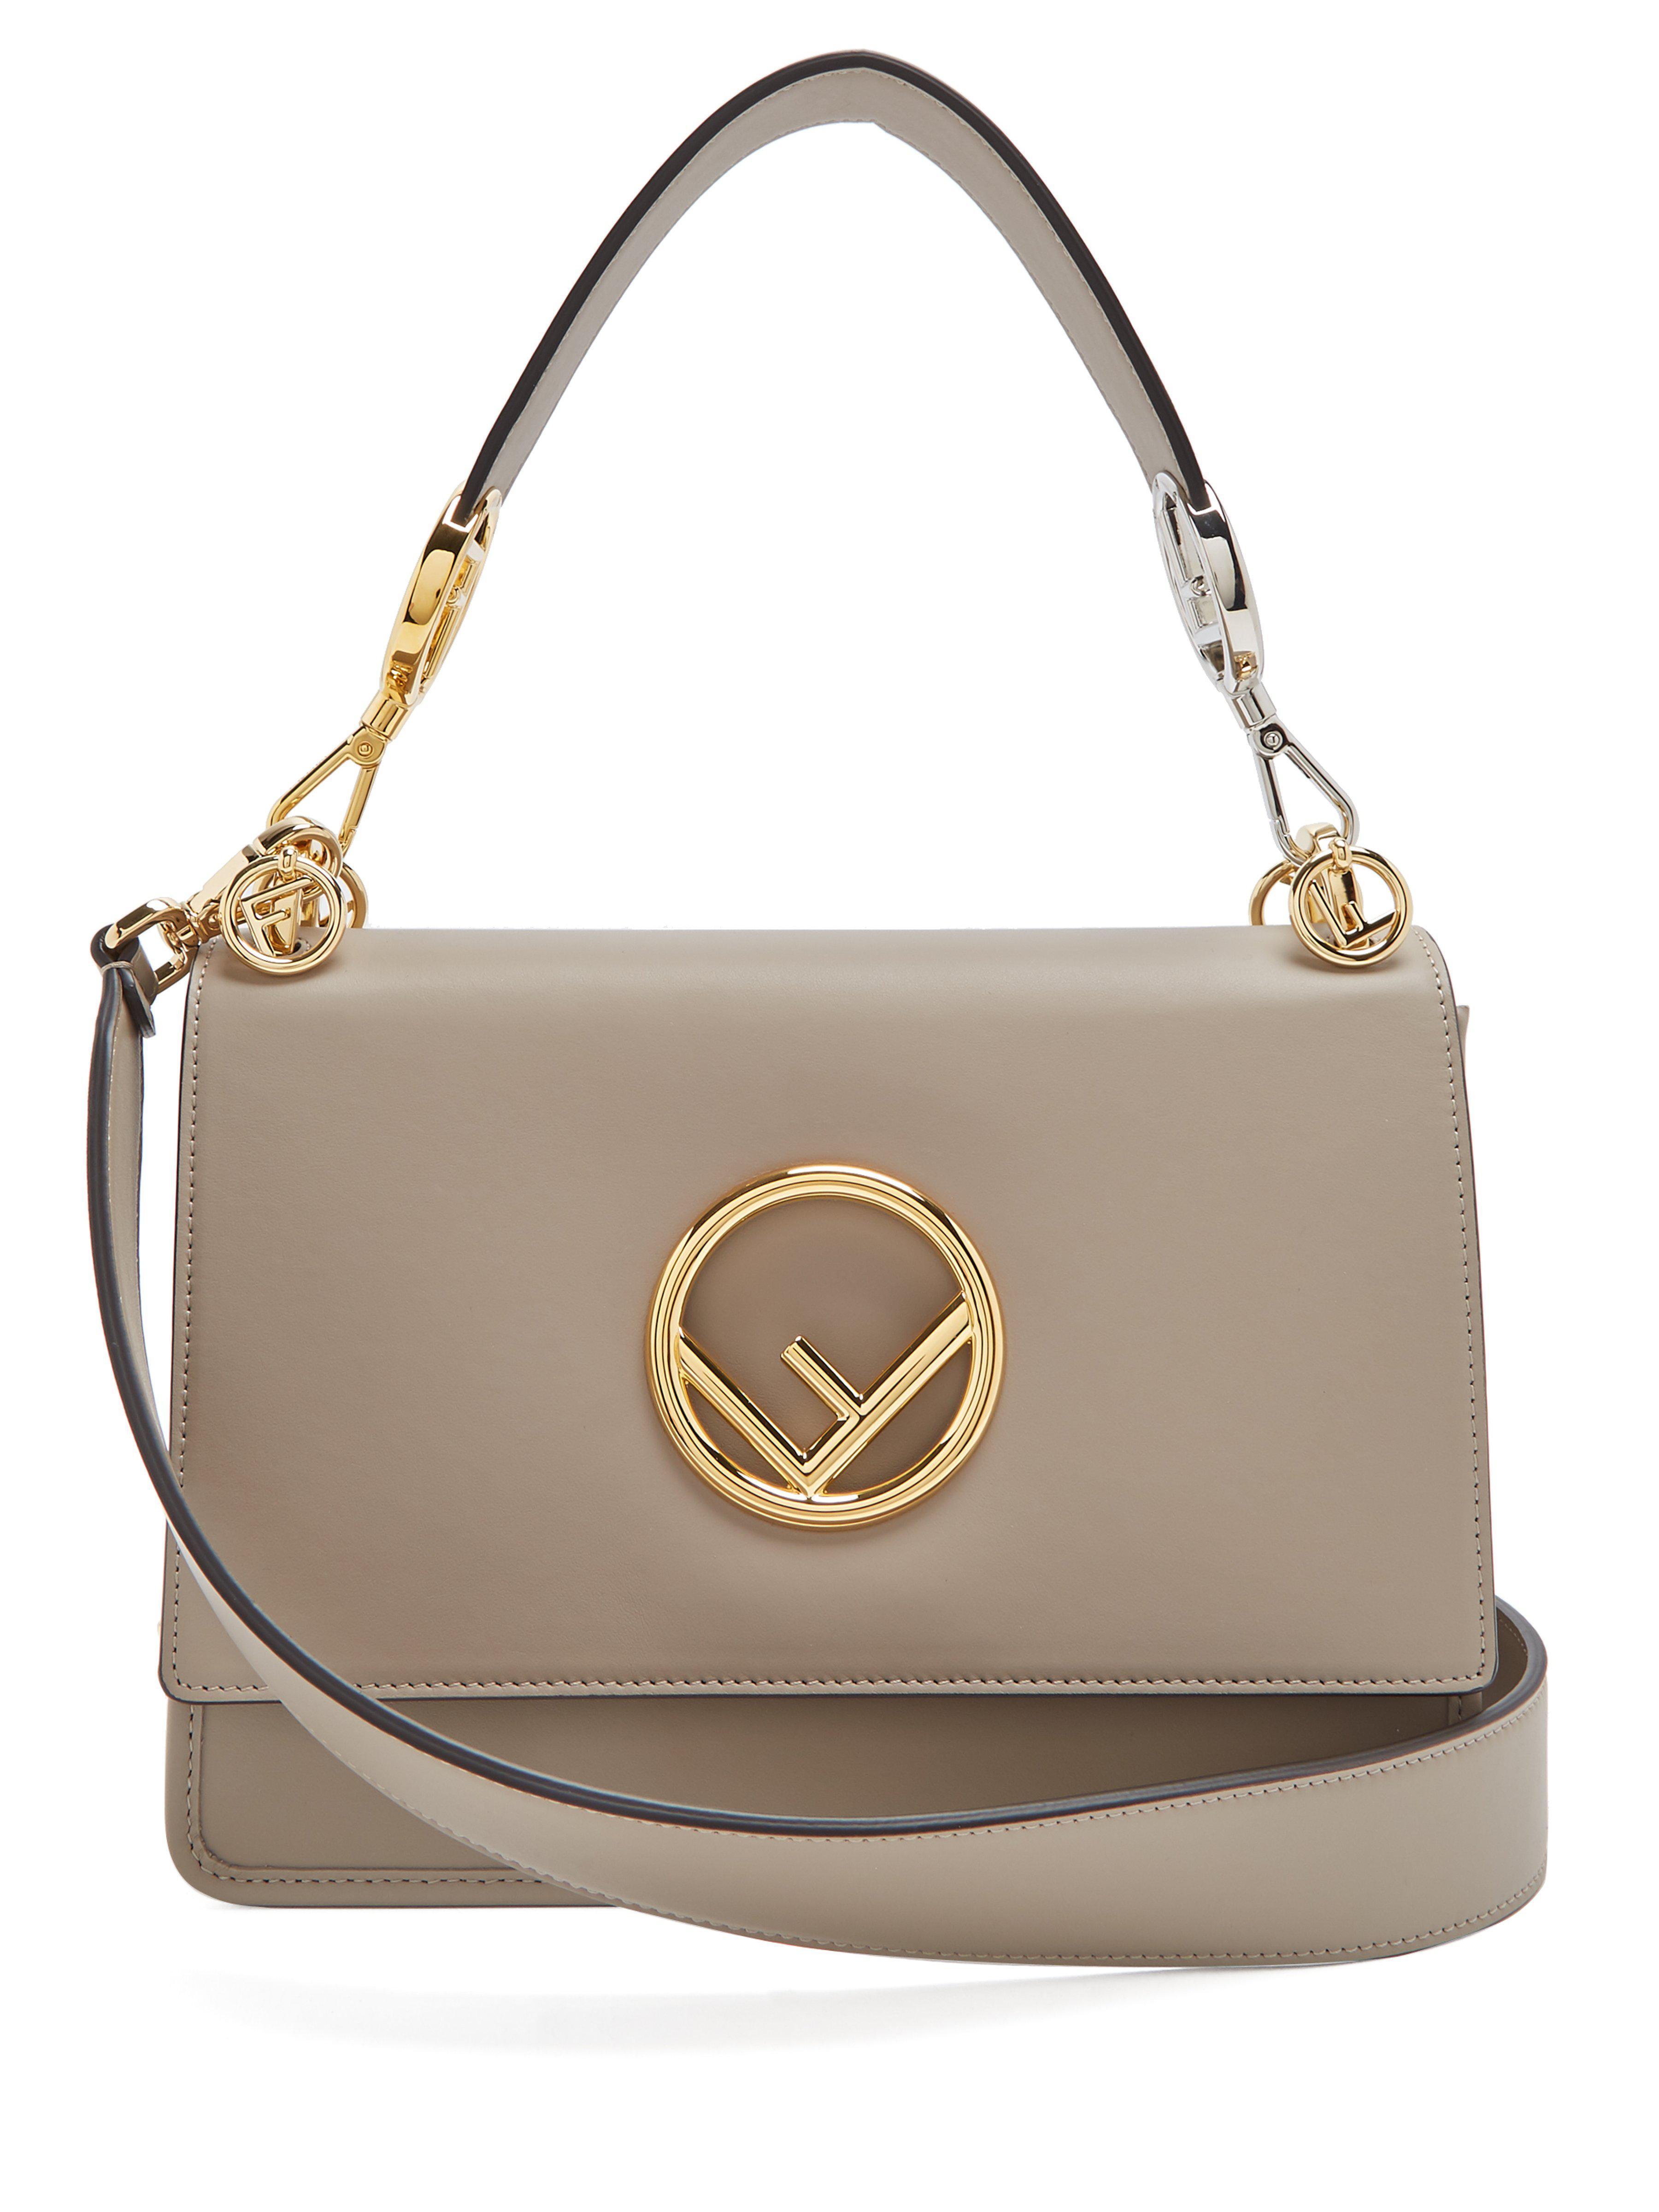 Fendi Kan I Logo Leather Shoulder Bag in Gray - Lyst 739ad64b3cf2e